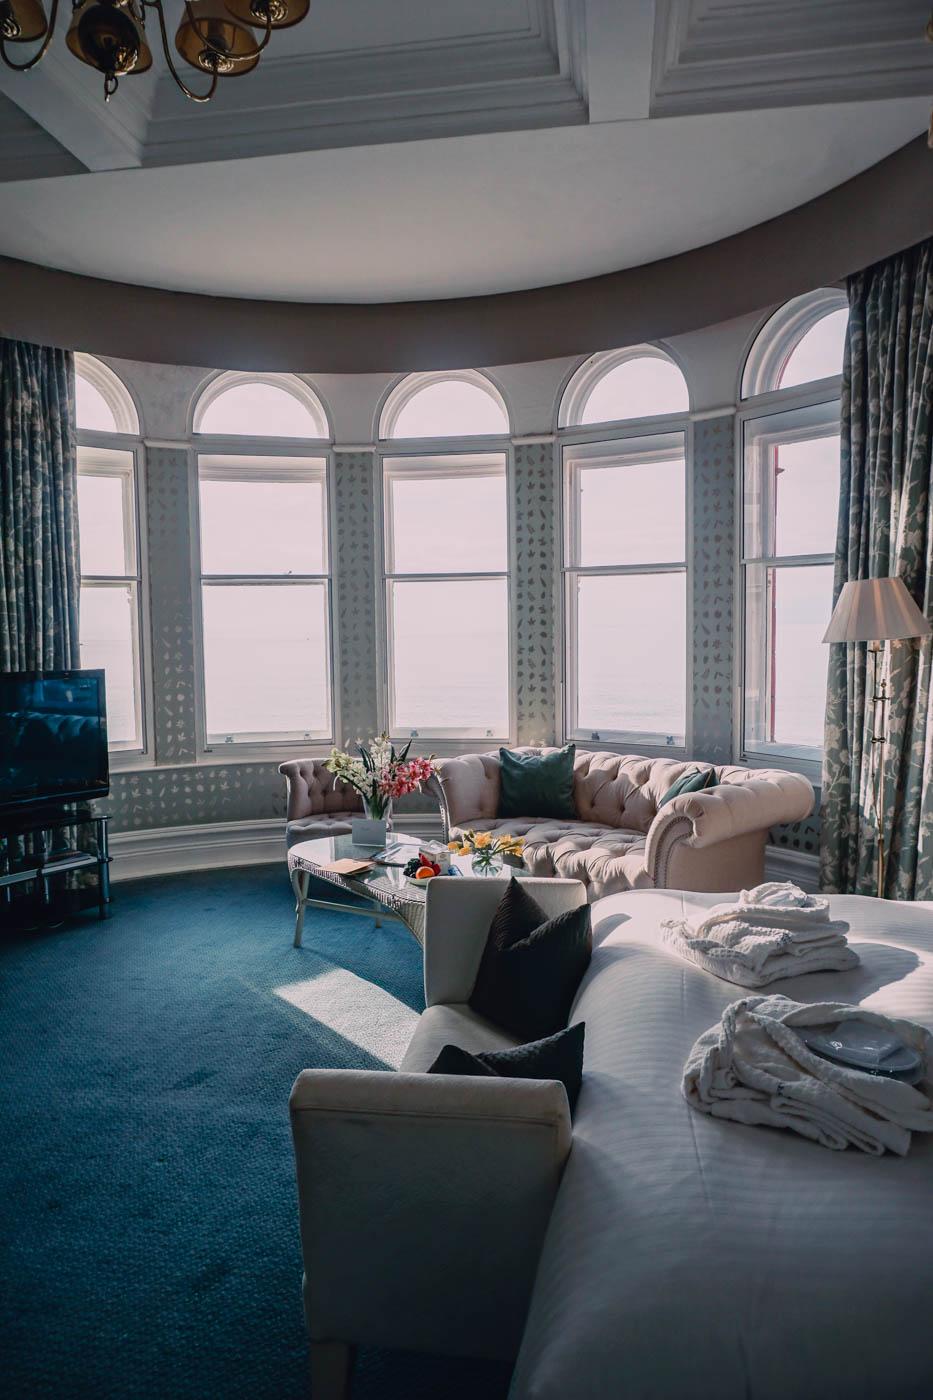 Rooms at The Headland Hotel, Cornwall